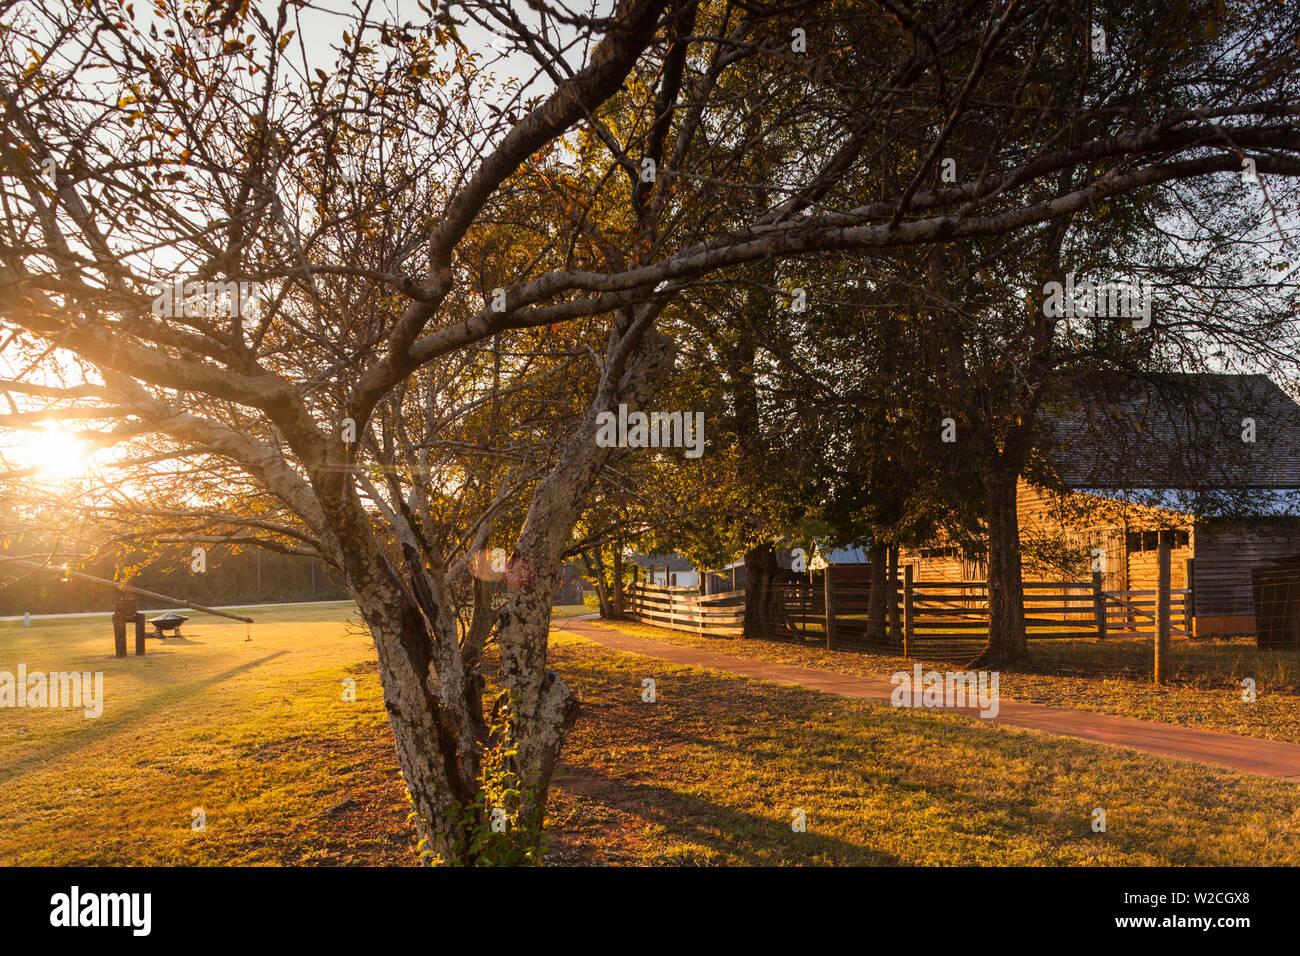 USA, Georgia, Plains, Jimmy Carter National Historic Site, Jimmy Carter's Boyhood Farm - Stock Image